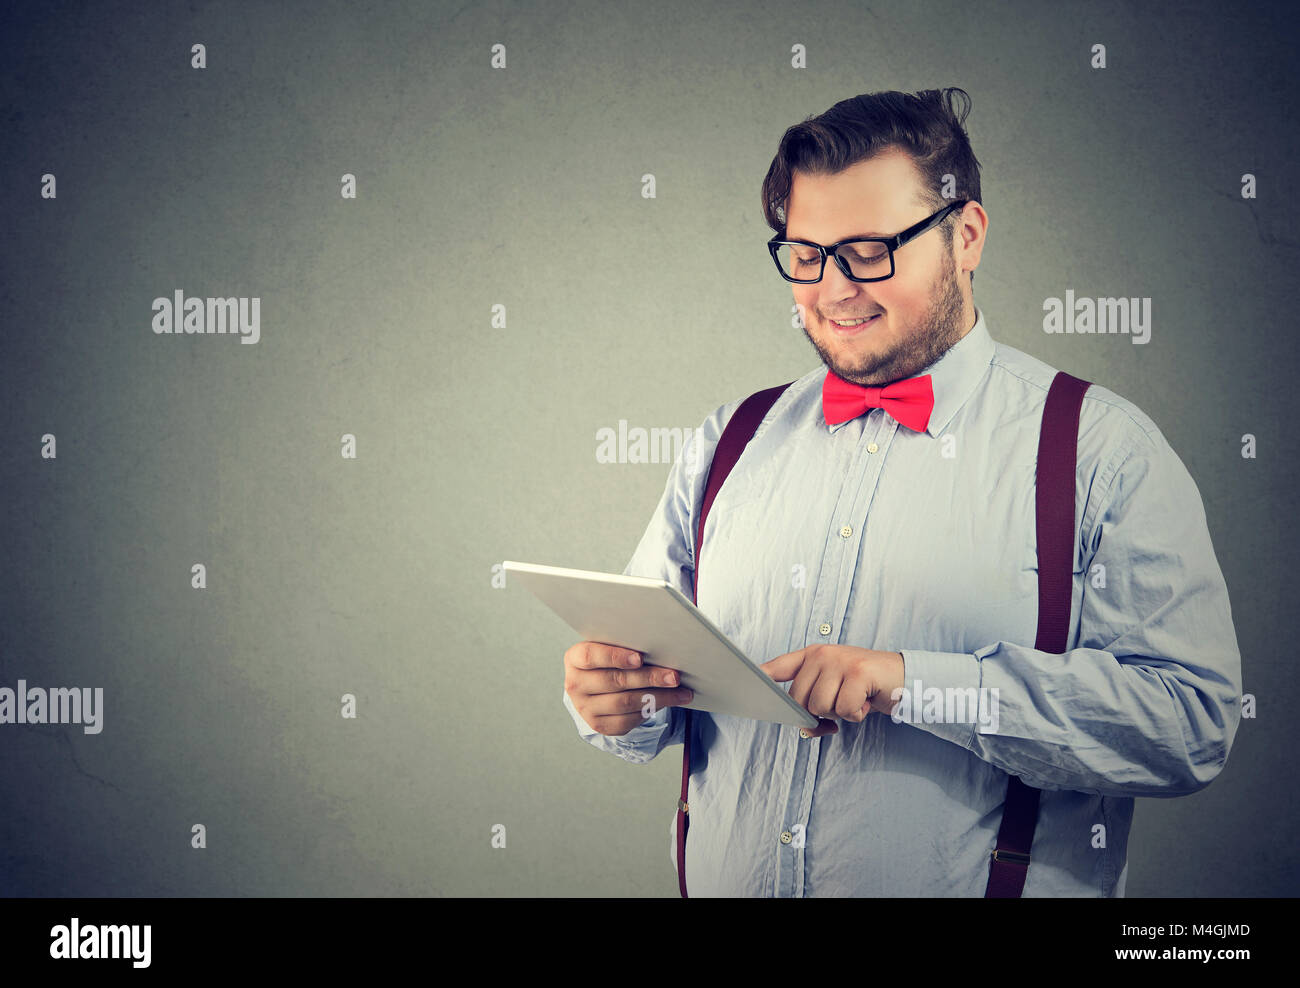 Impertinente joven hombre de anteojos mirando feliz mientras tocas tablet posando sobre fondo gris. Imagen De Stock